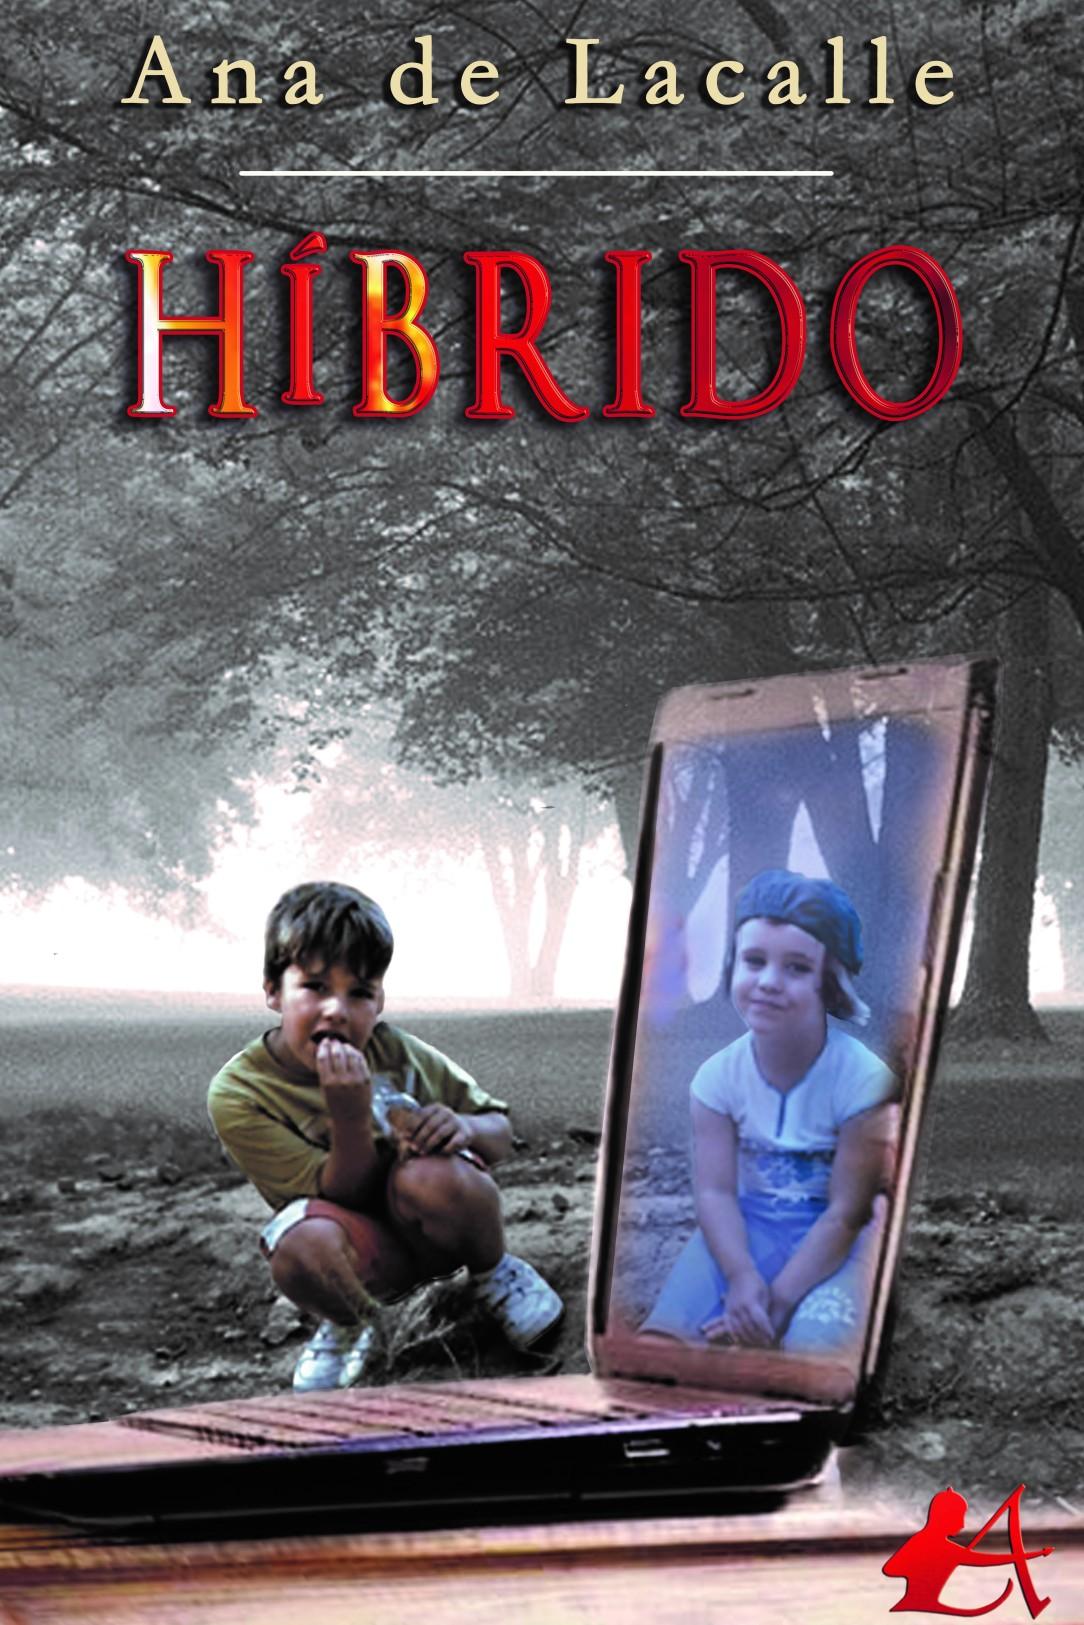 Portada Híbrido 11[6845]